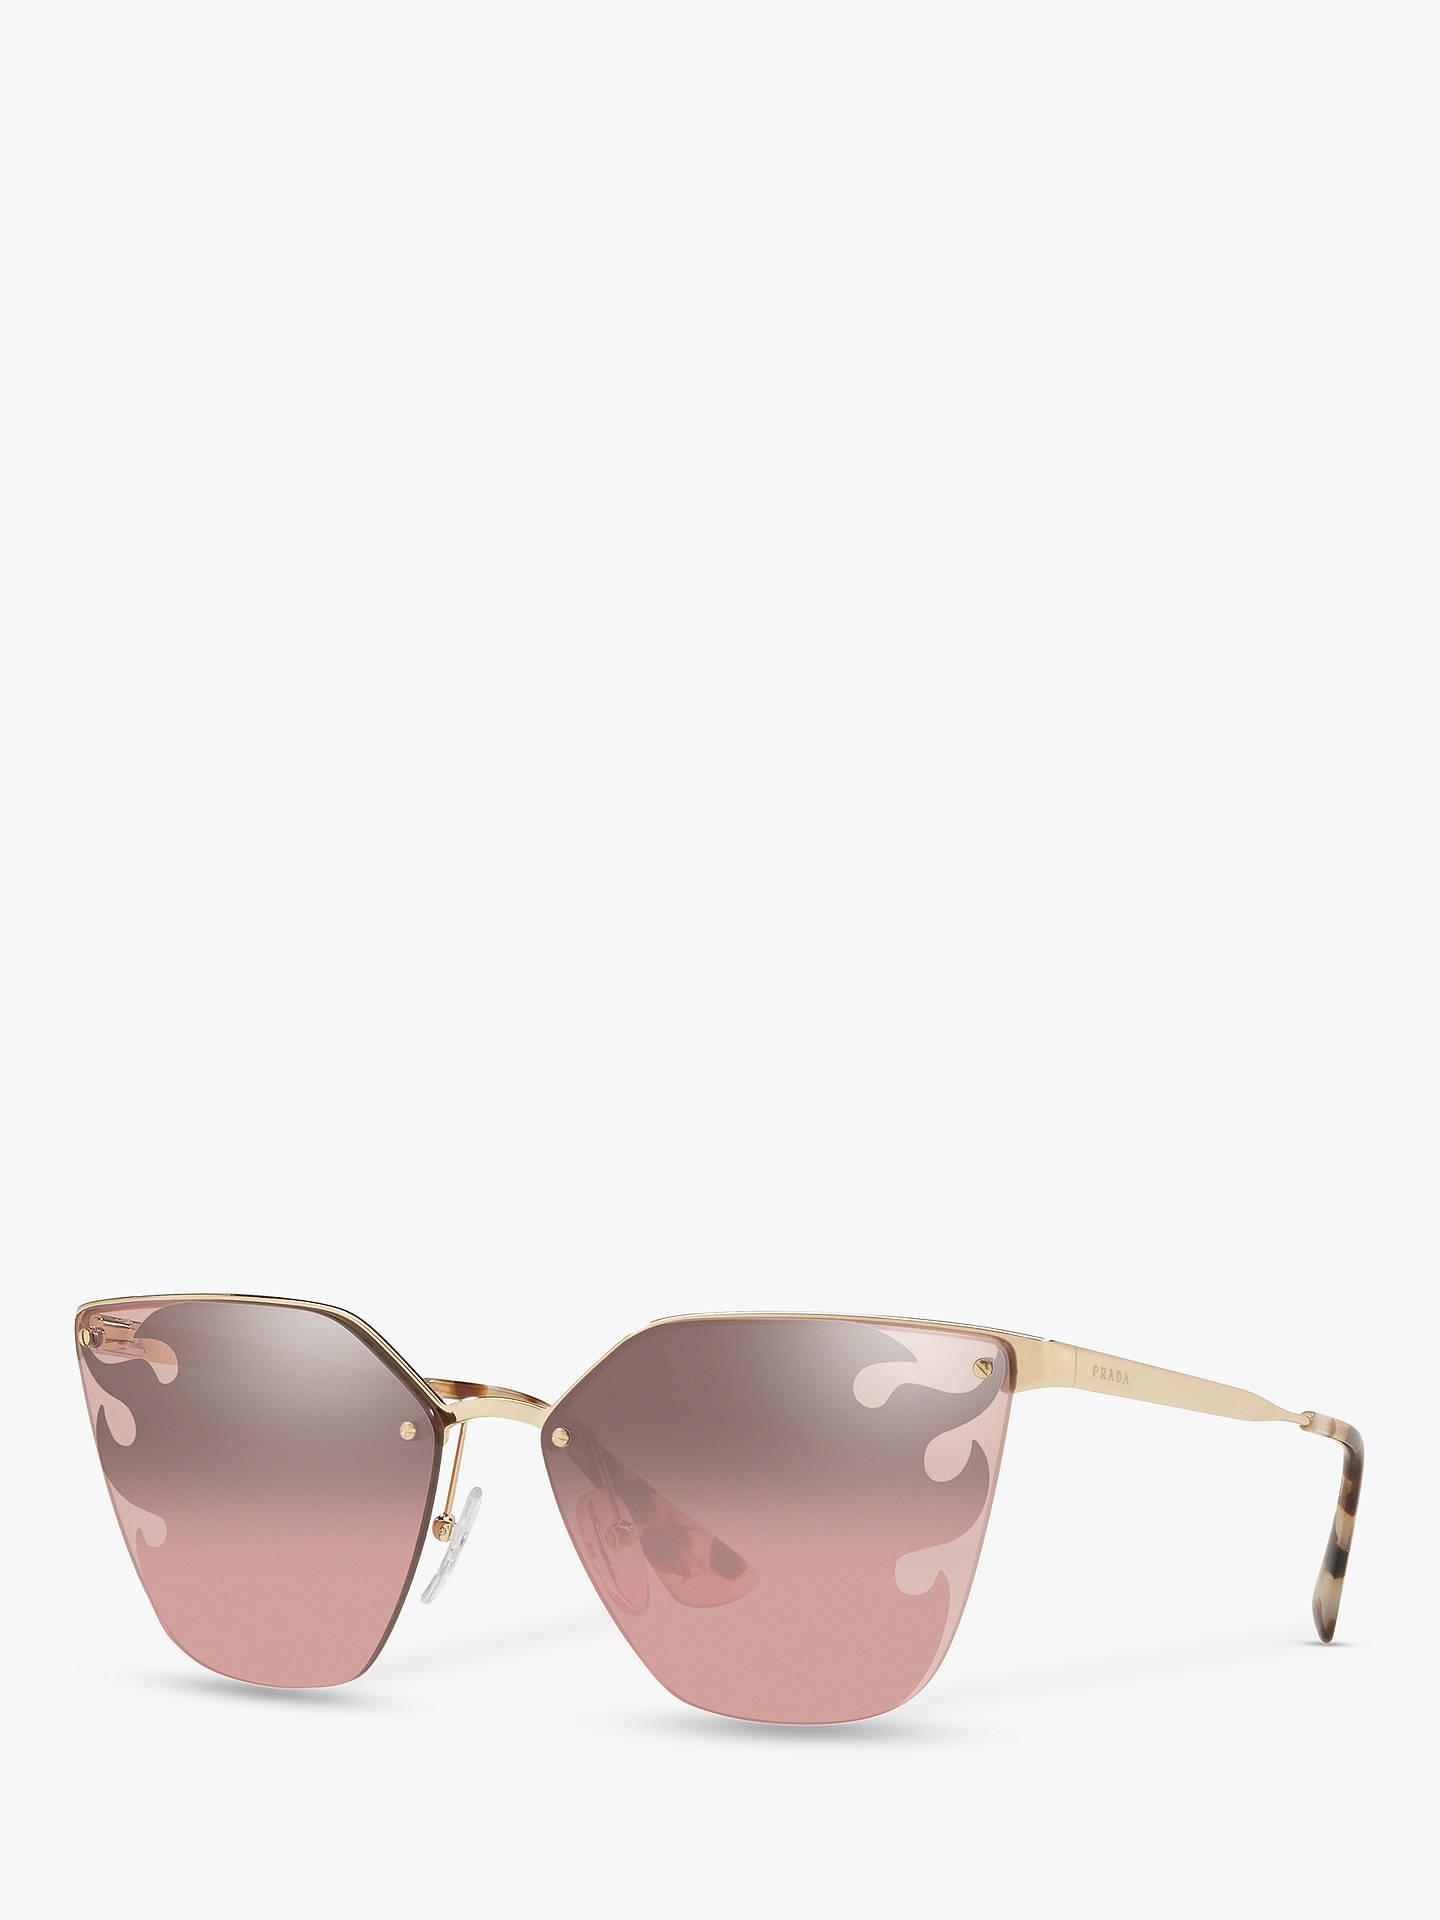 ee24760d2ad0c Buy Prada PR 68TS Women s Cat s Eye Sunglasses